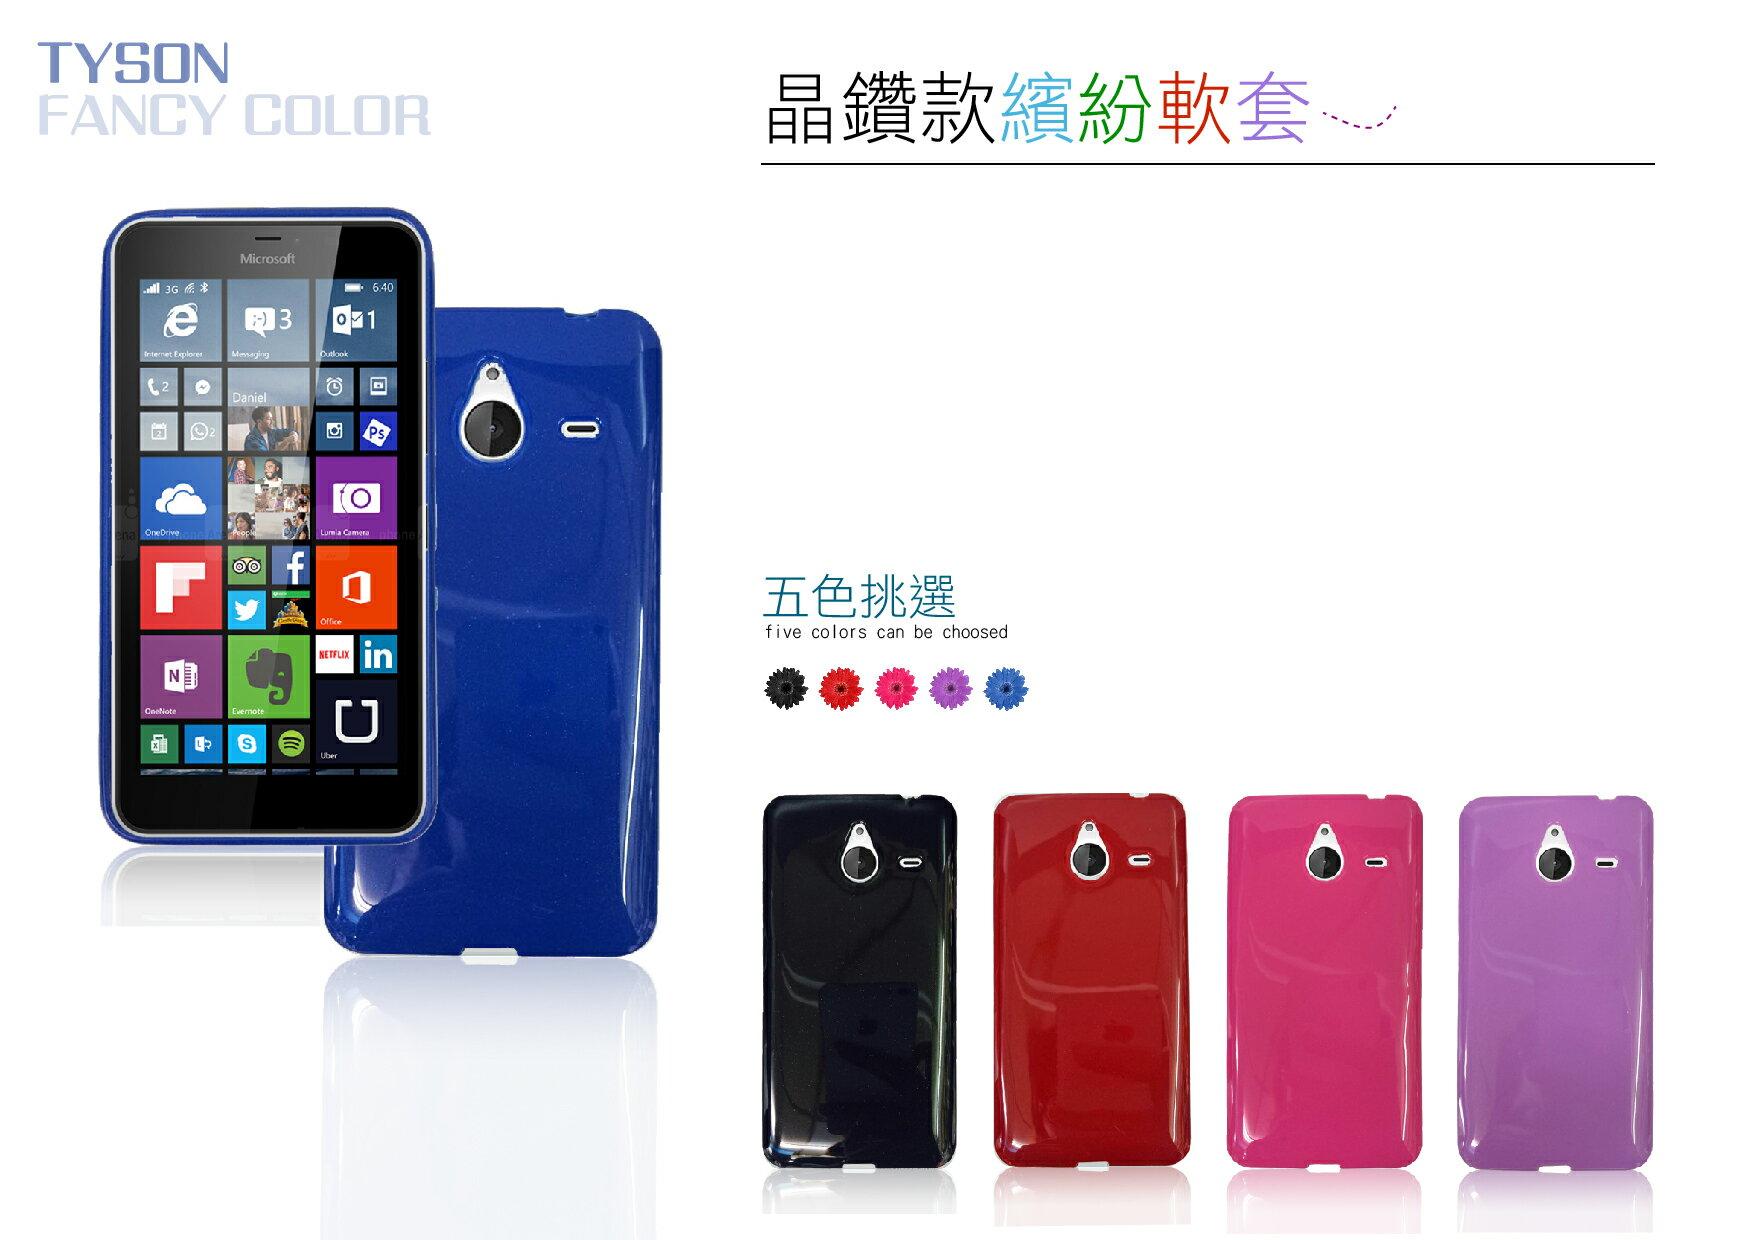 BENQ T55 5.5 手機專用 繽紛晶鑽系列 保護殼 軟殼 手機背蓋 果凍套